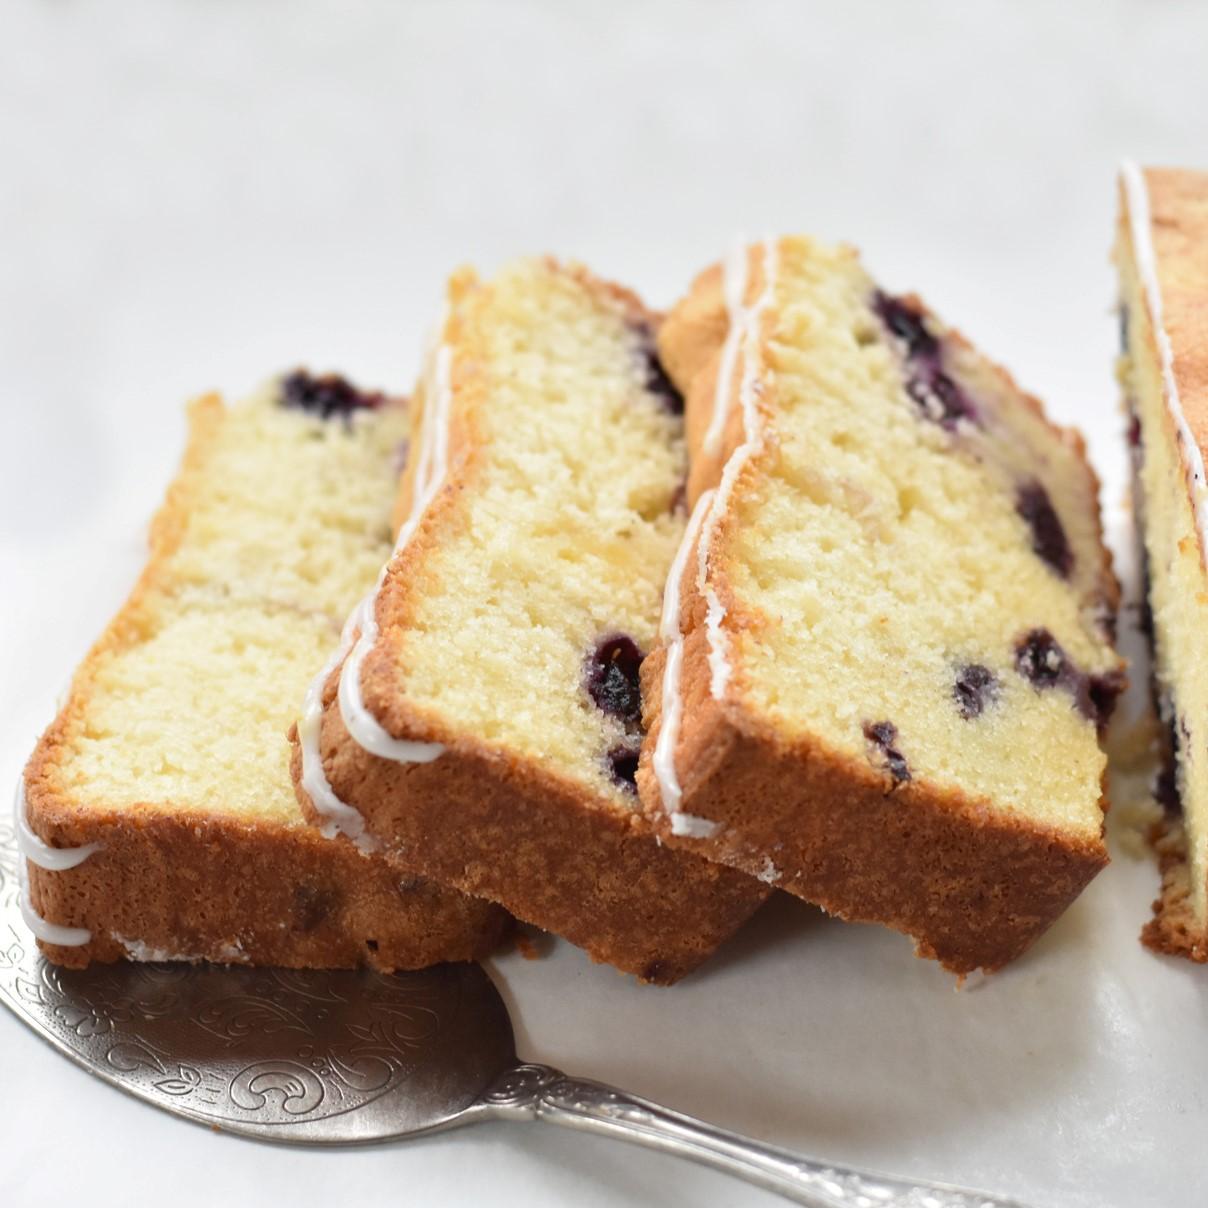 Slices of the Lemon Blueberry Pound Cake.